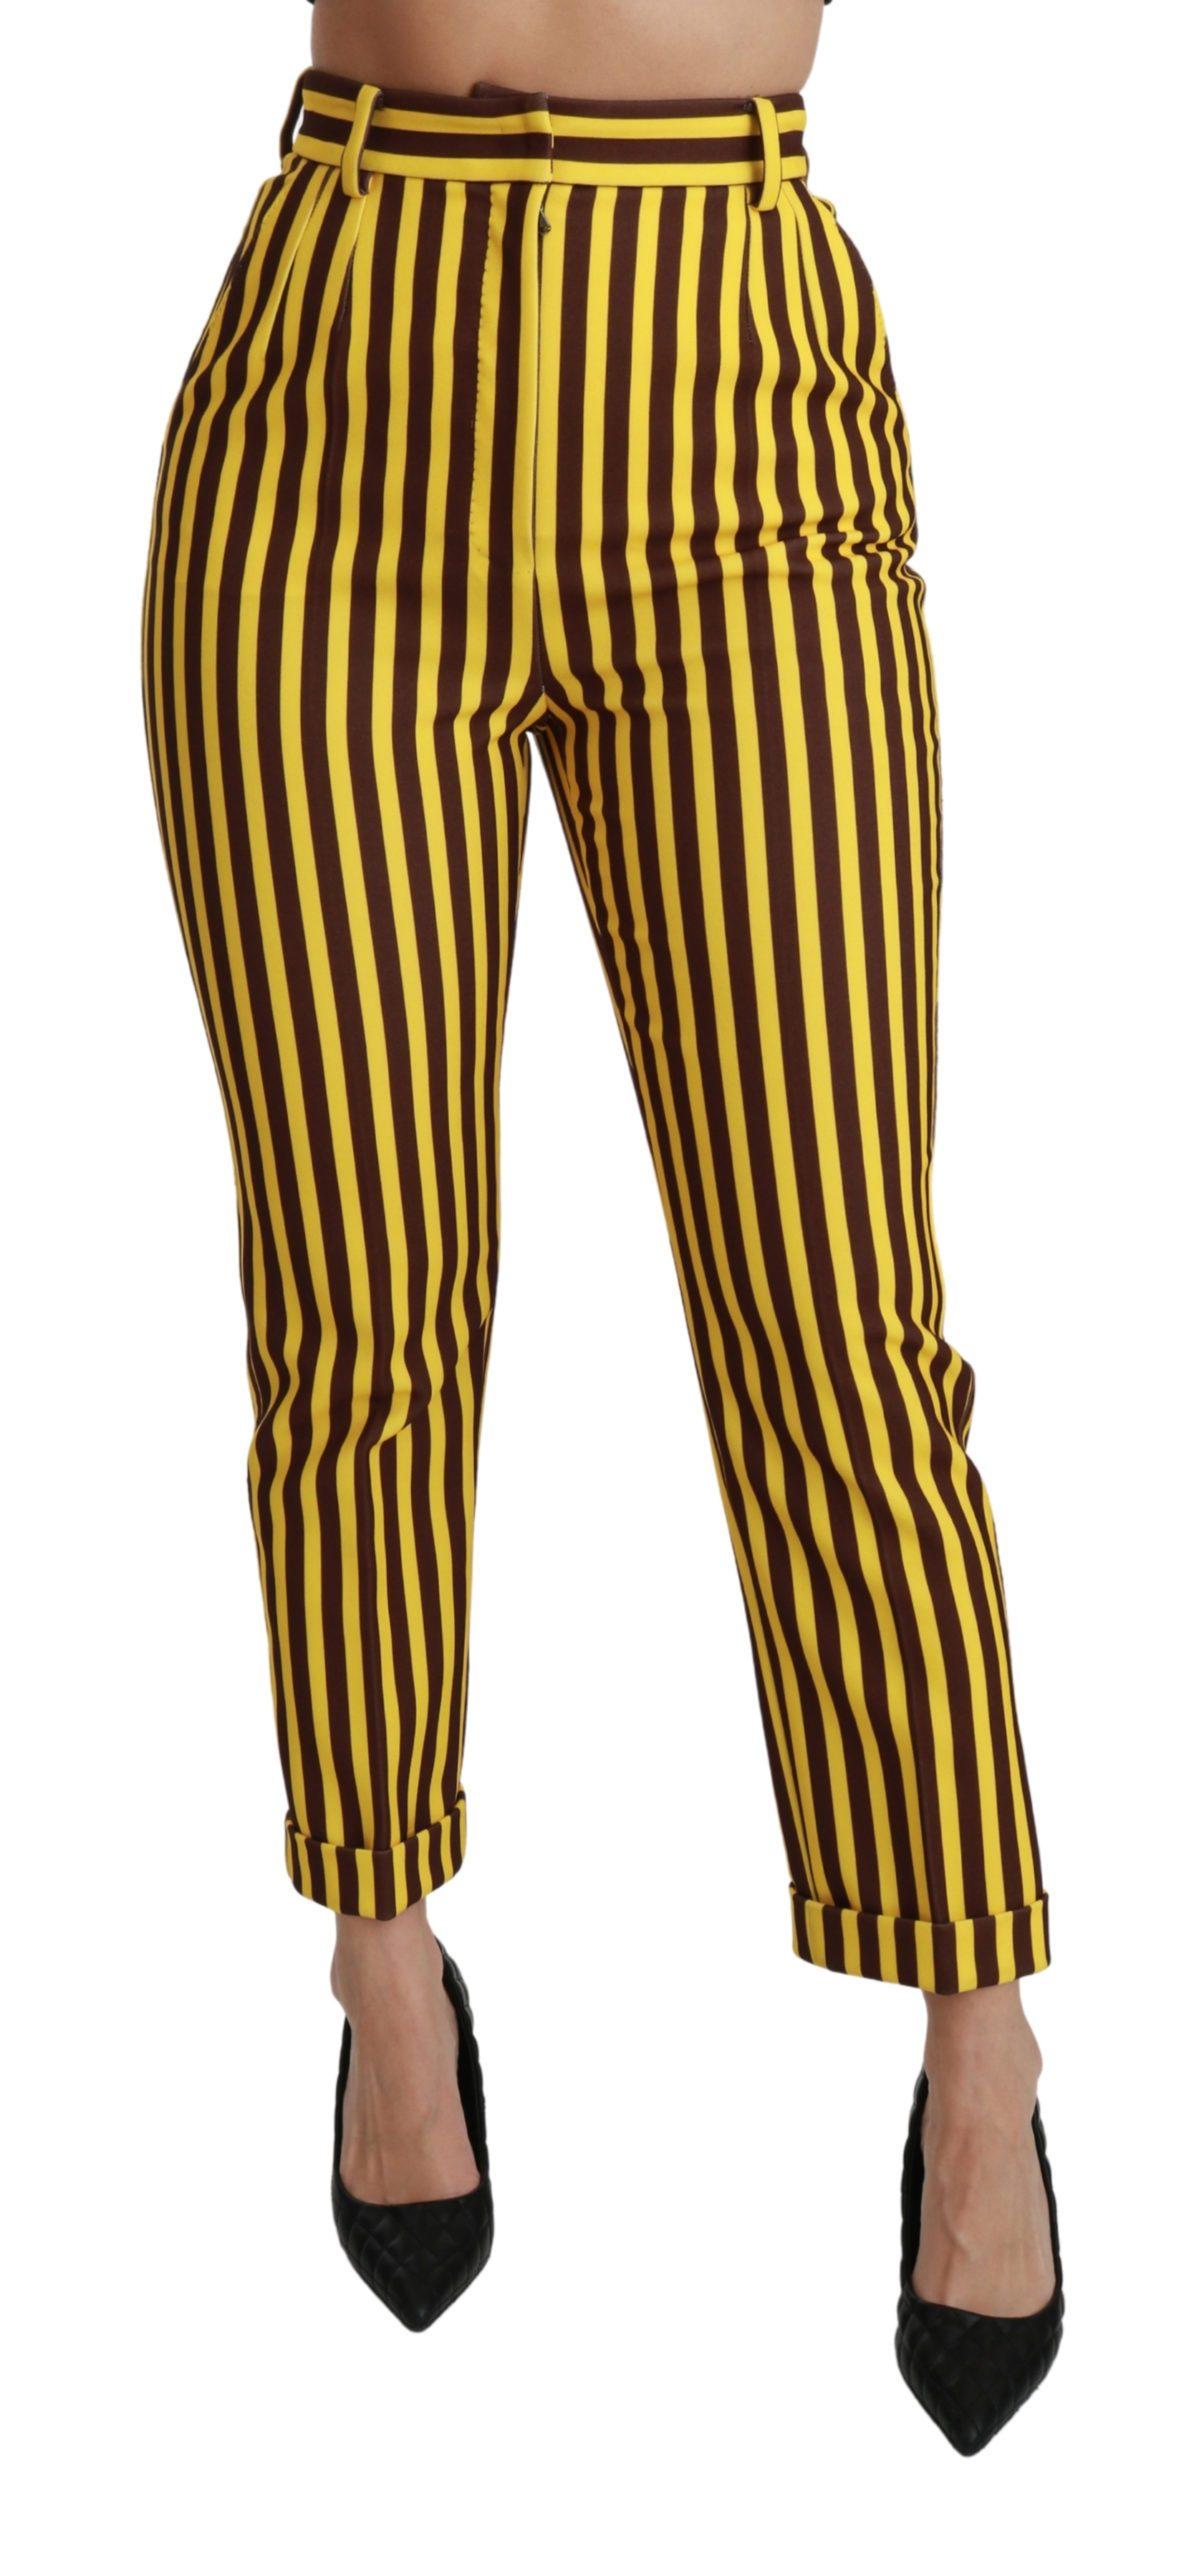 Dolce & Gabbana Women's Striped High Waist Skinny Trouser Yellow PAN70928 - IT40|S